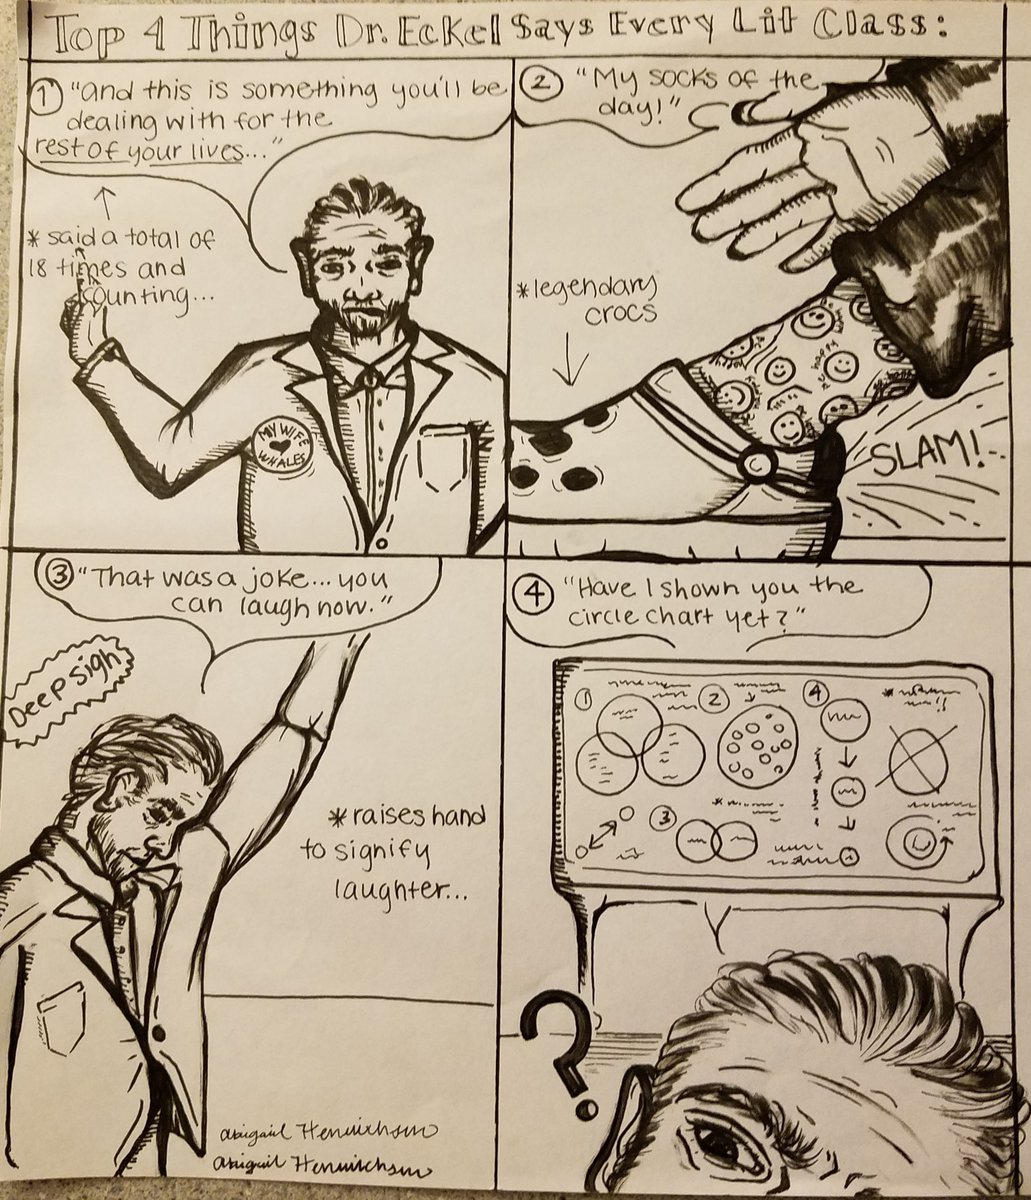 A #students #cartoon #characterdesign of a #teacher, your truly #classroomTales #artwork #sketches #socks #Crocs #teacherlife @INTOY2014 @MR_ABUD @MarkSadler16 @WeAreTeachers @21stCenturyTch @teacher2teacher